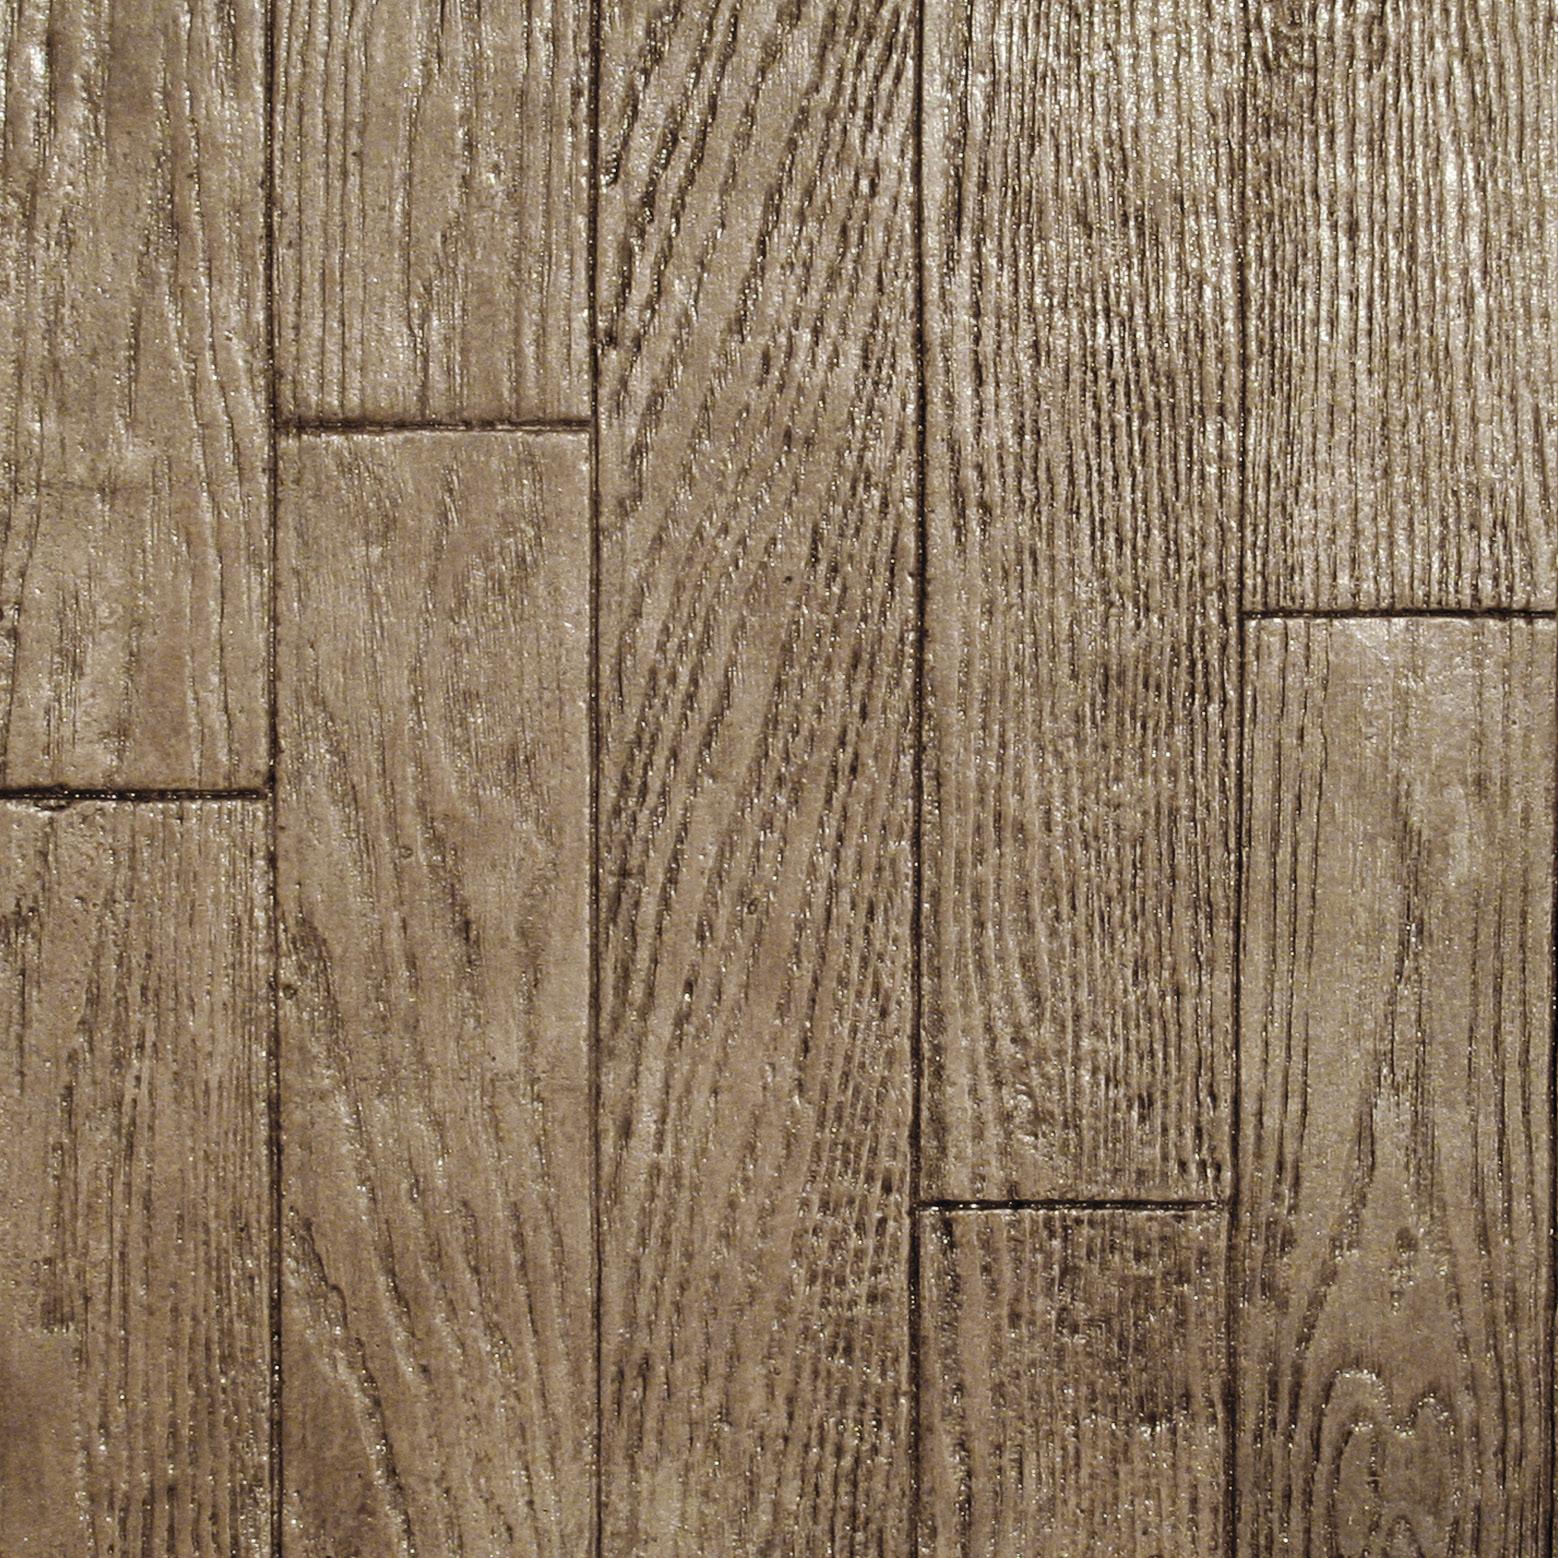 3-5in Hardwood Planks